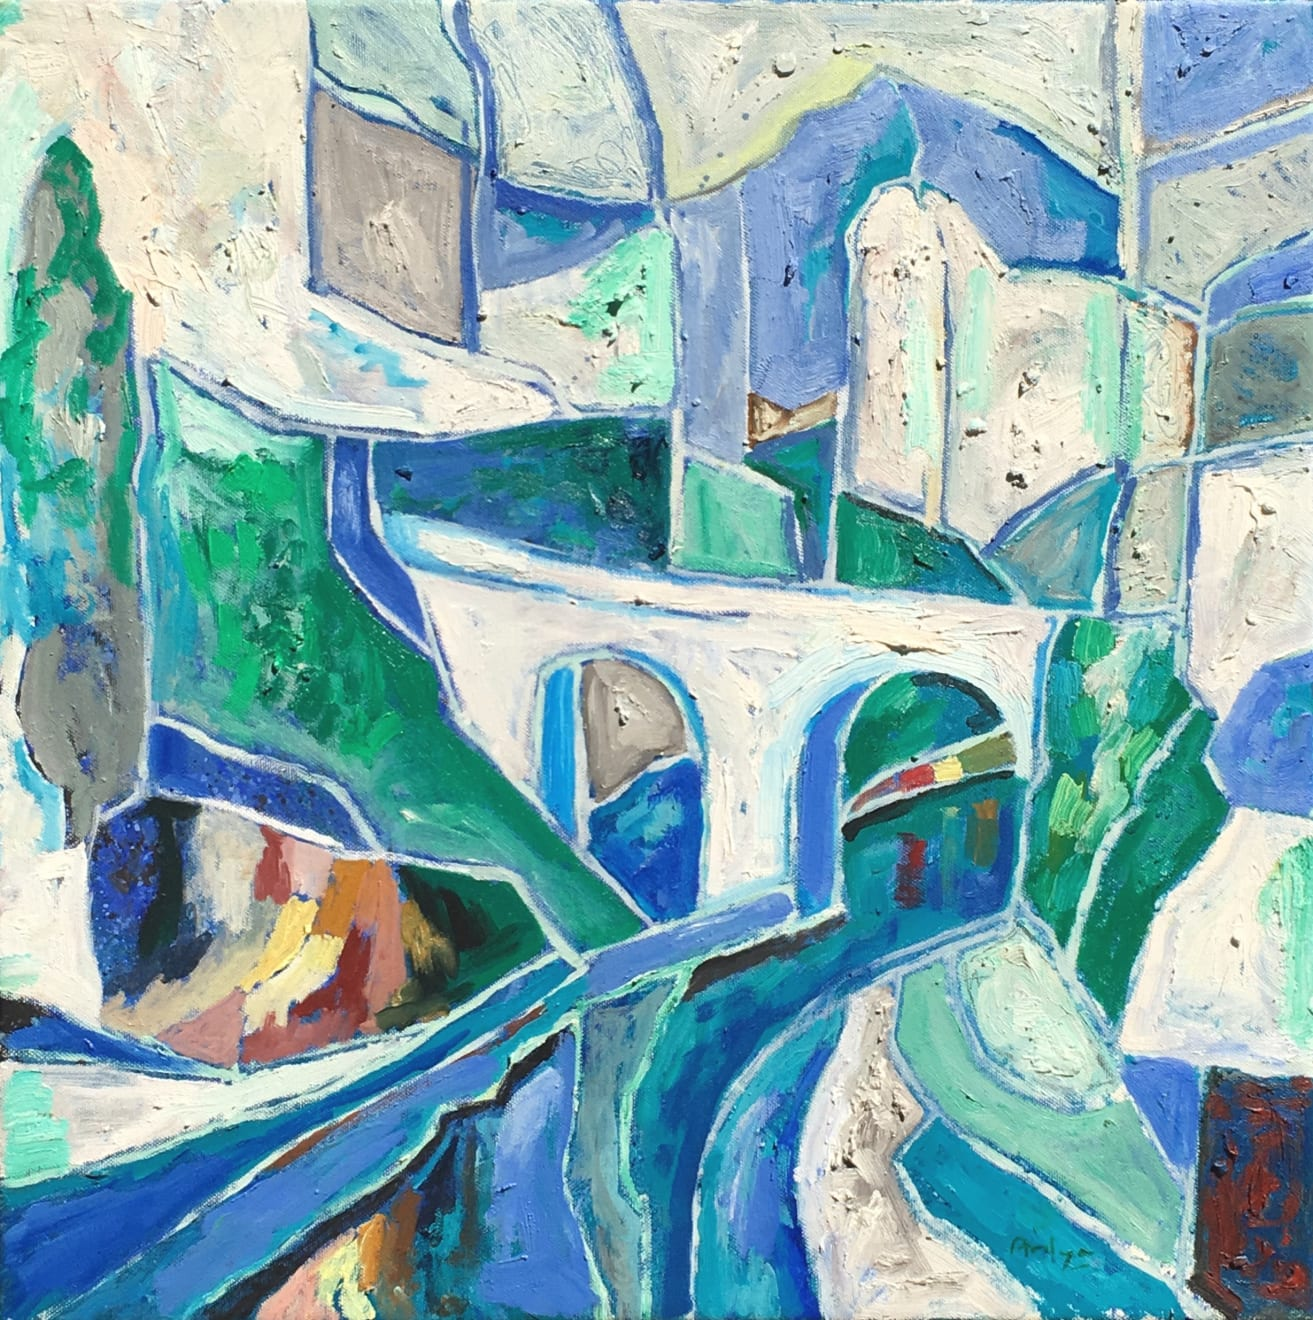 Summer Auction 2020, LOT 76 - Ardyn Halter - 'The River', 2017